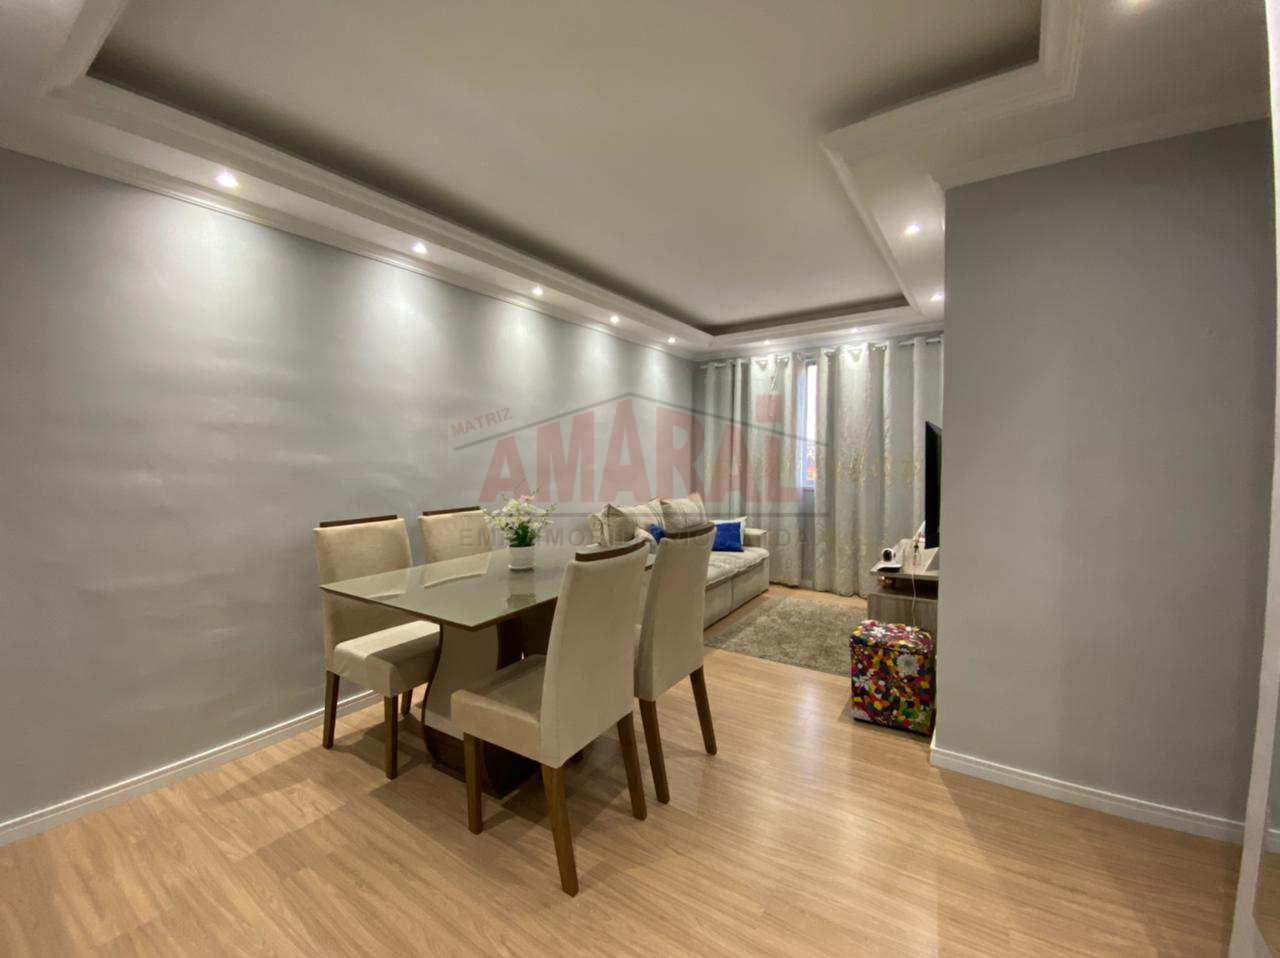 Apartamento com 2 dorms, Cidade Satélite Santa Bárbara, São Paulo - R$ 188 mil, Cod: 11092